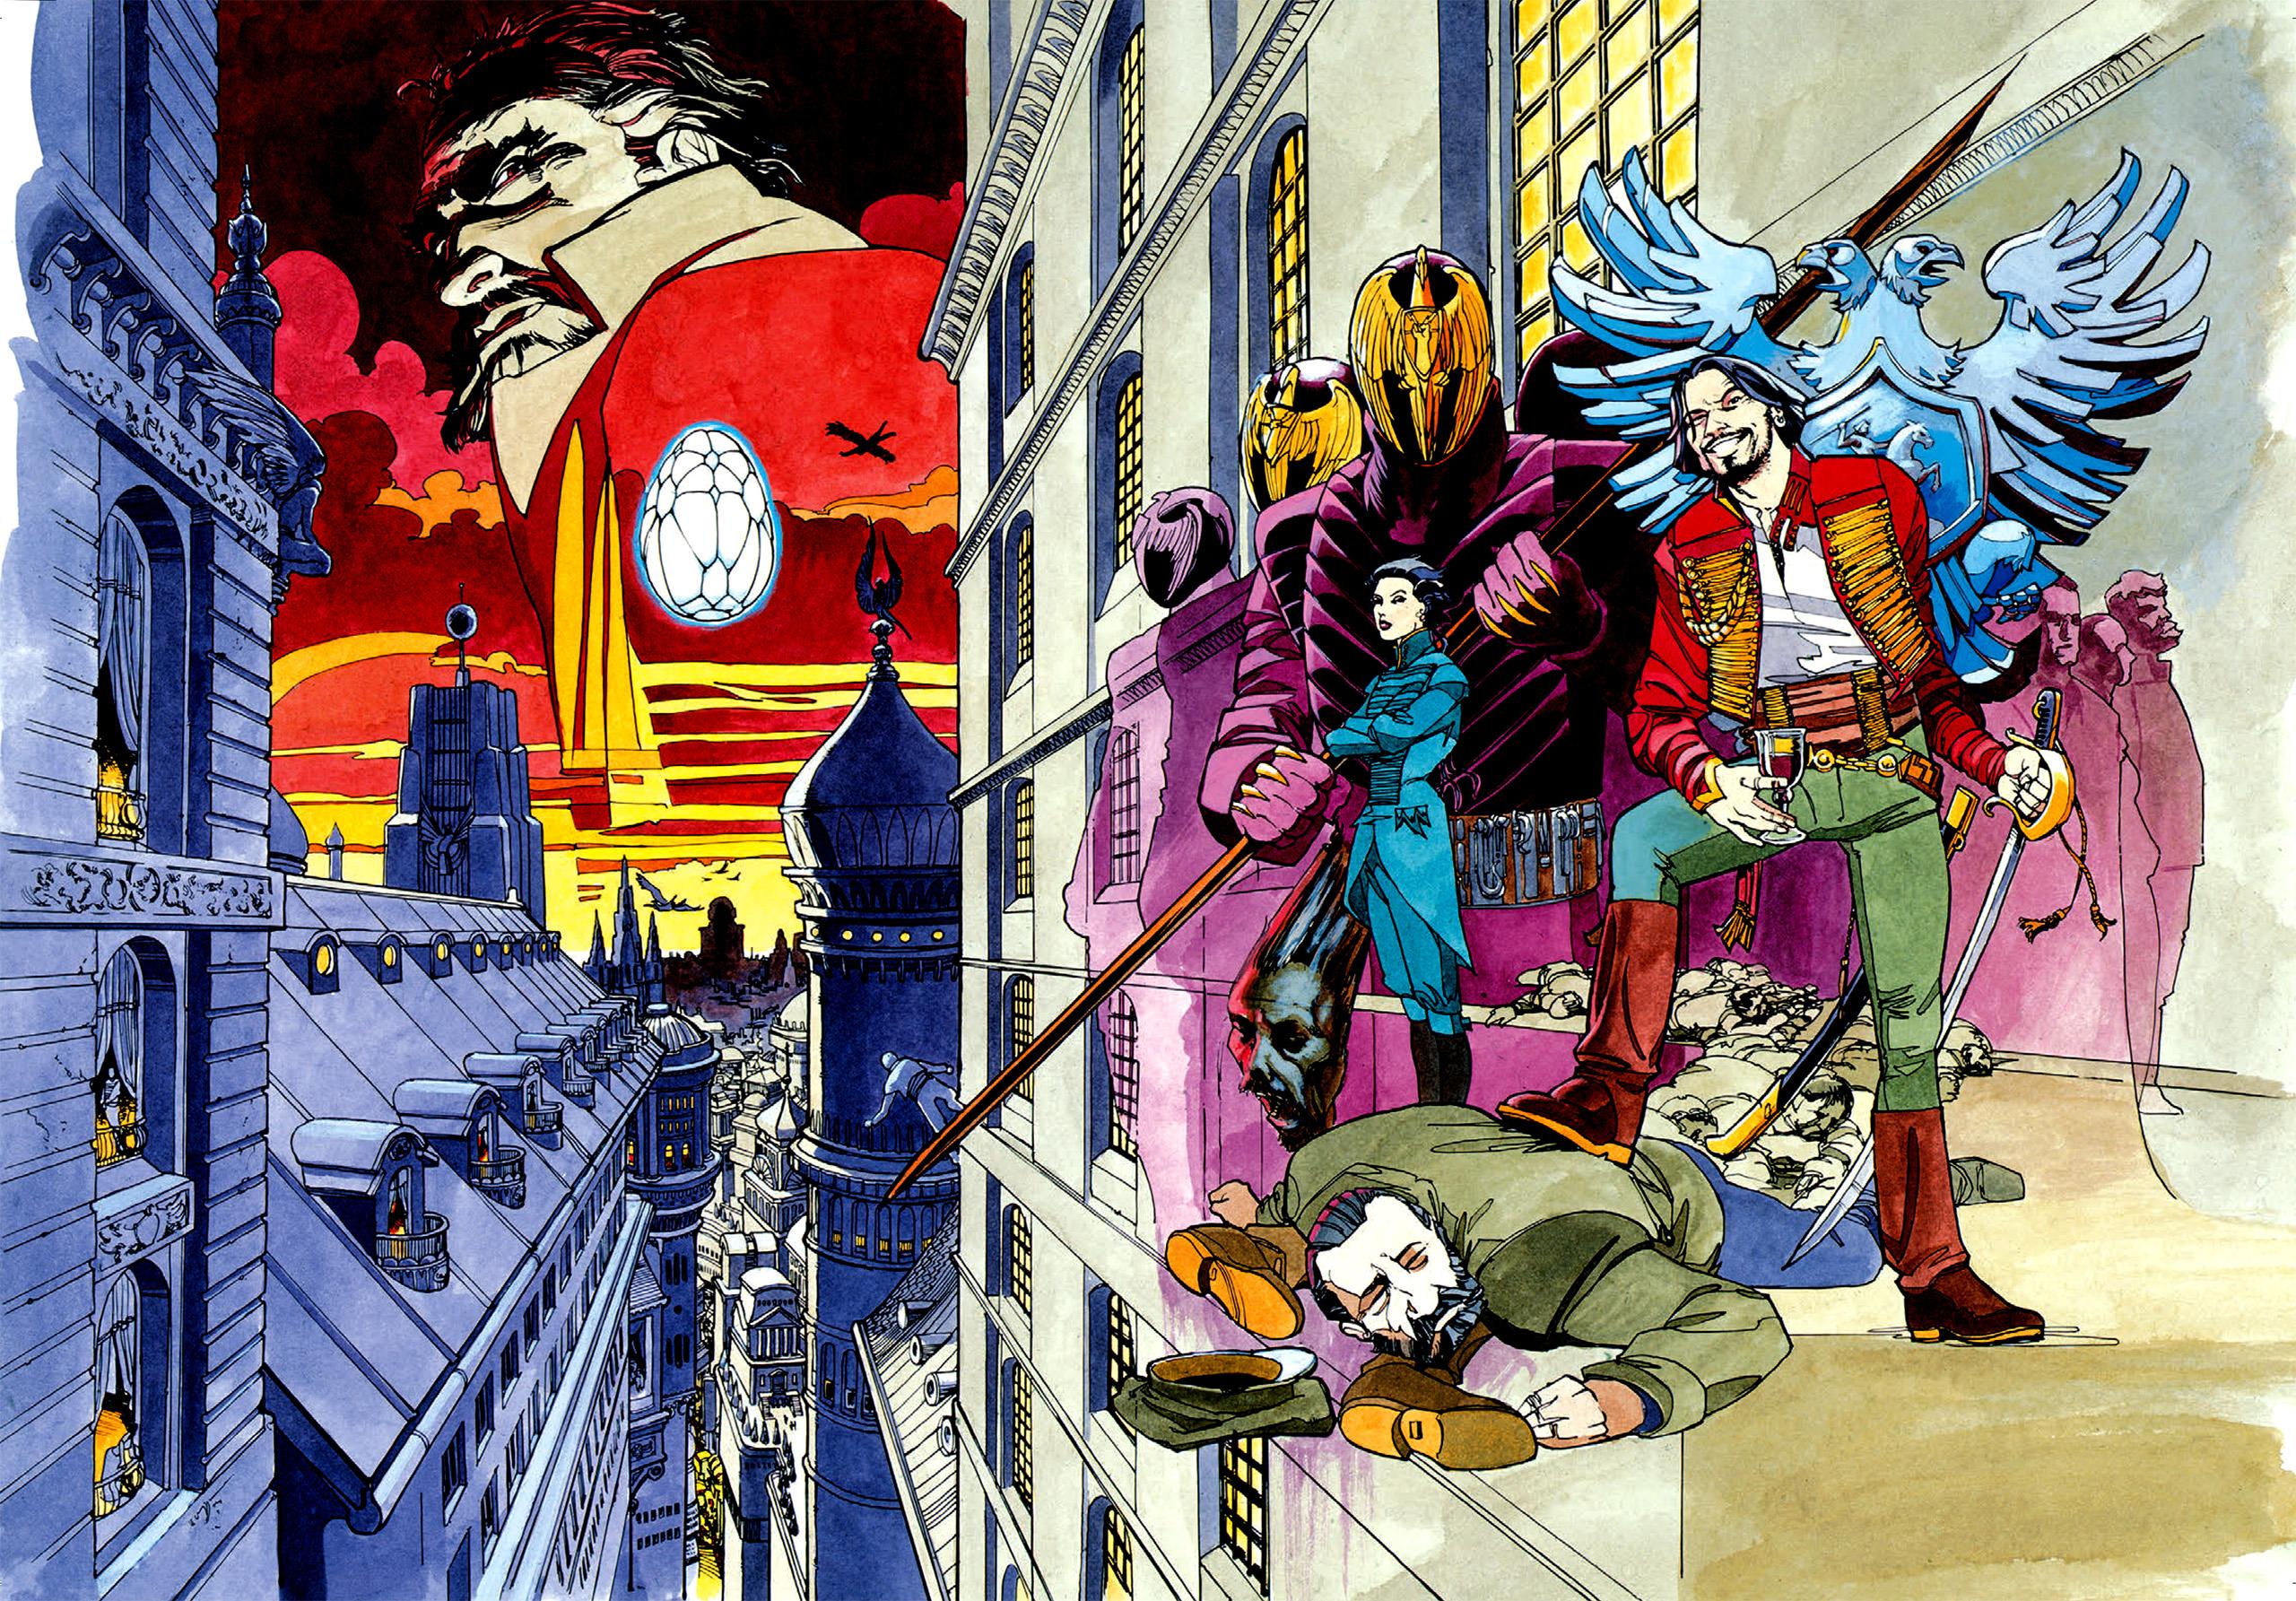 Read online Nikolai Dante comic -  Issue # TPB 1 - 6